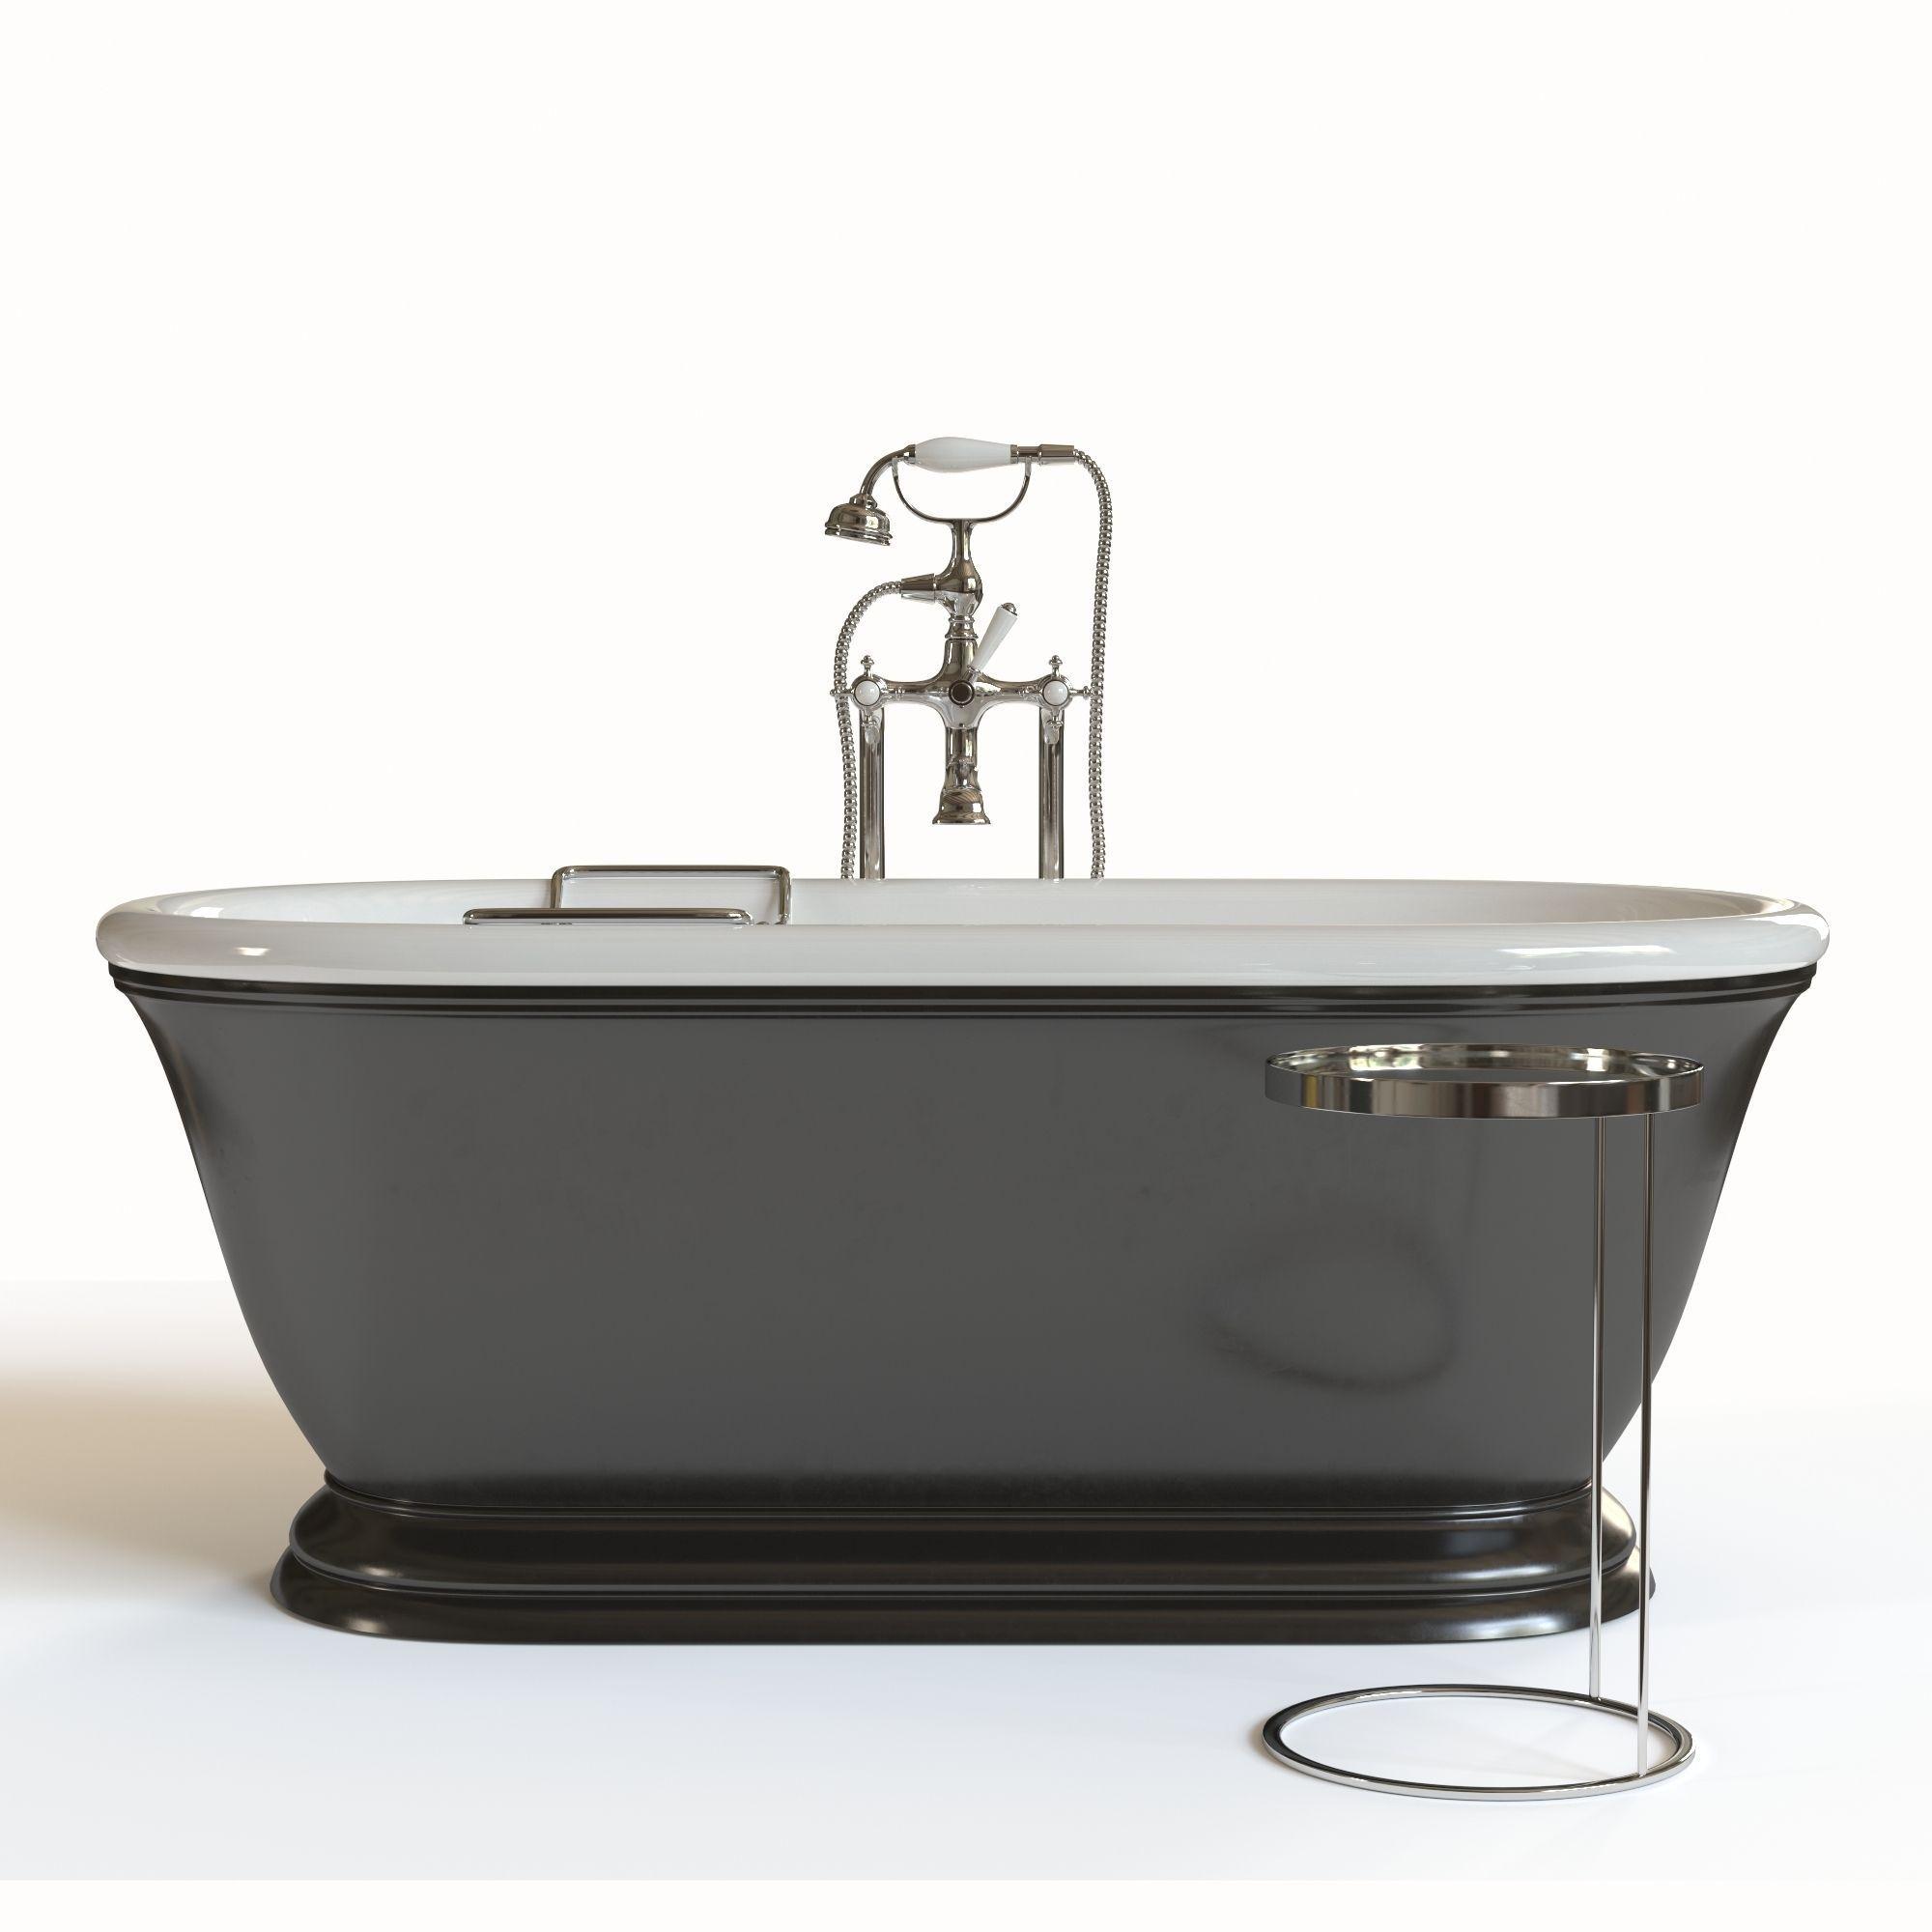 tub wayfair soaking pdx improvement k kohler bathtub alcove home reviews x villager bellwether